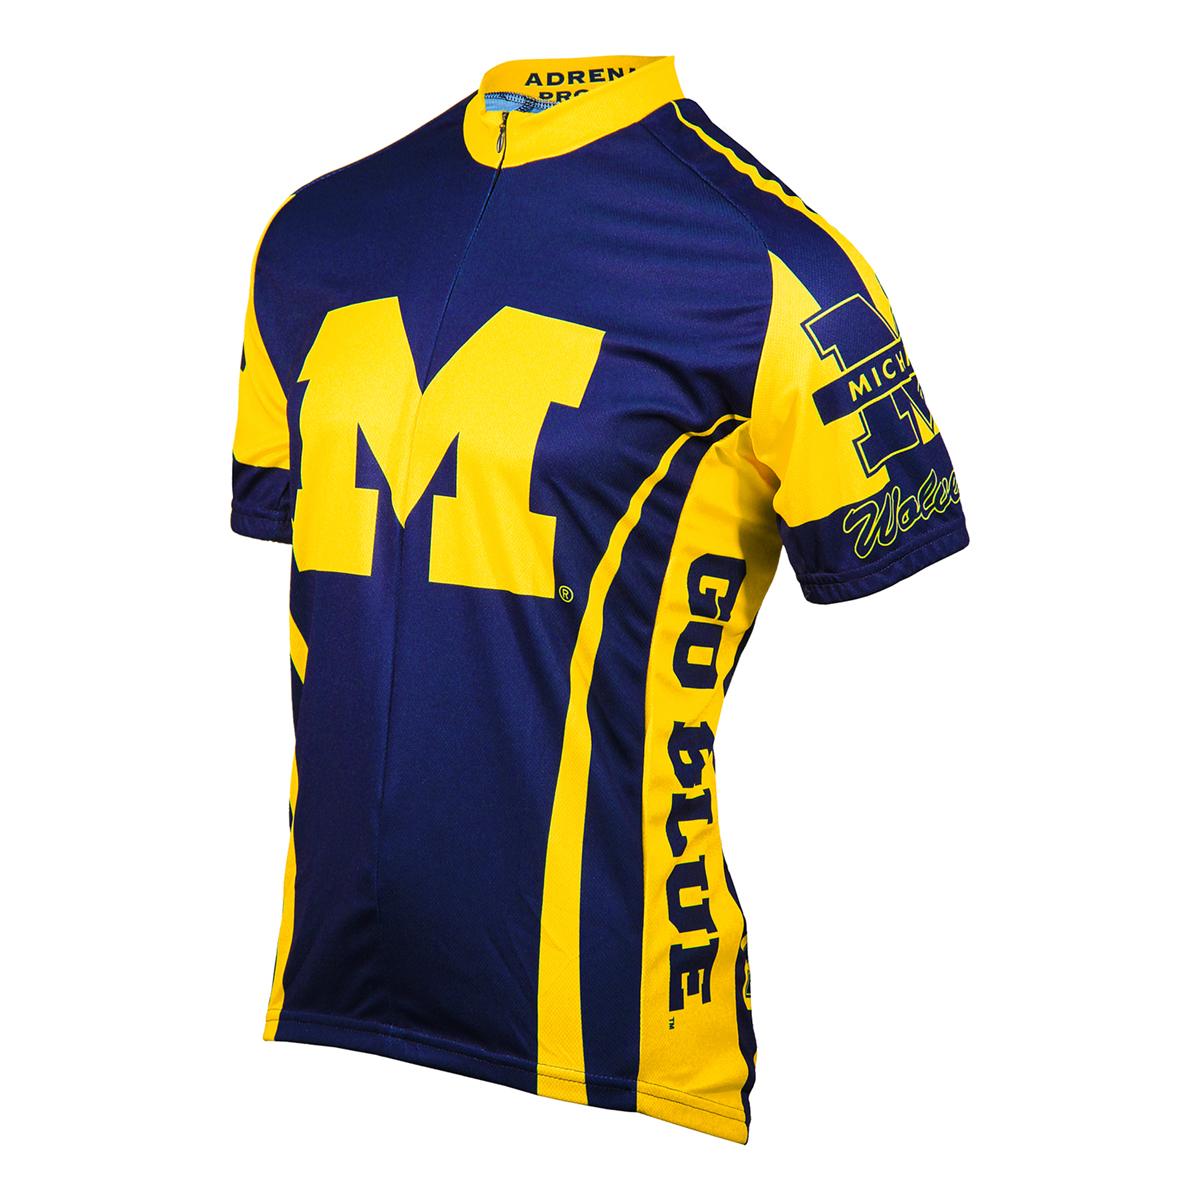 Adrenaline Promotions University of Michigan Cycling Jersey